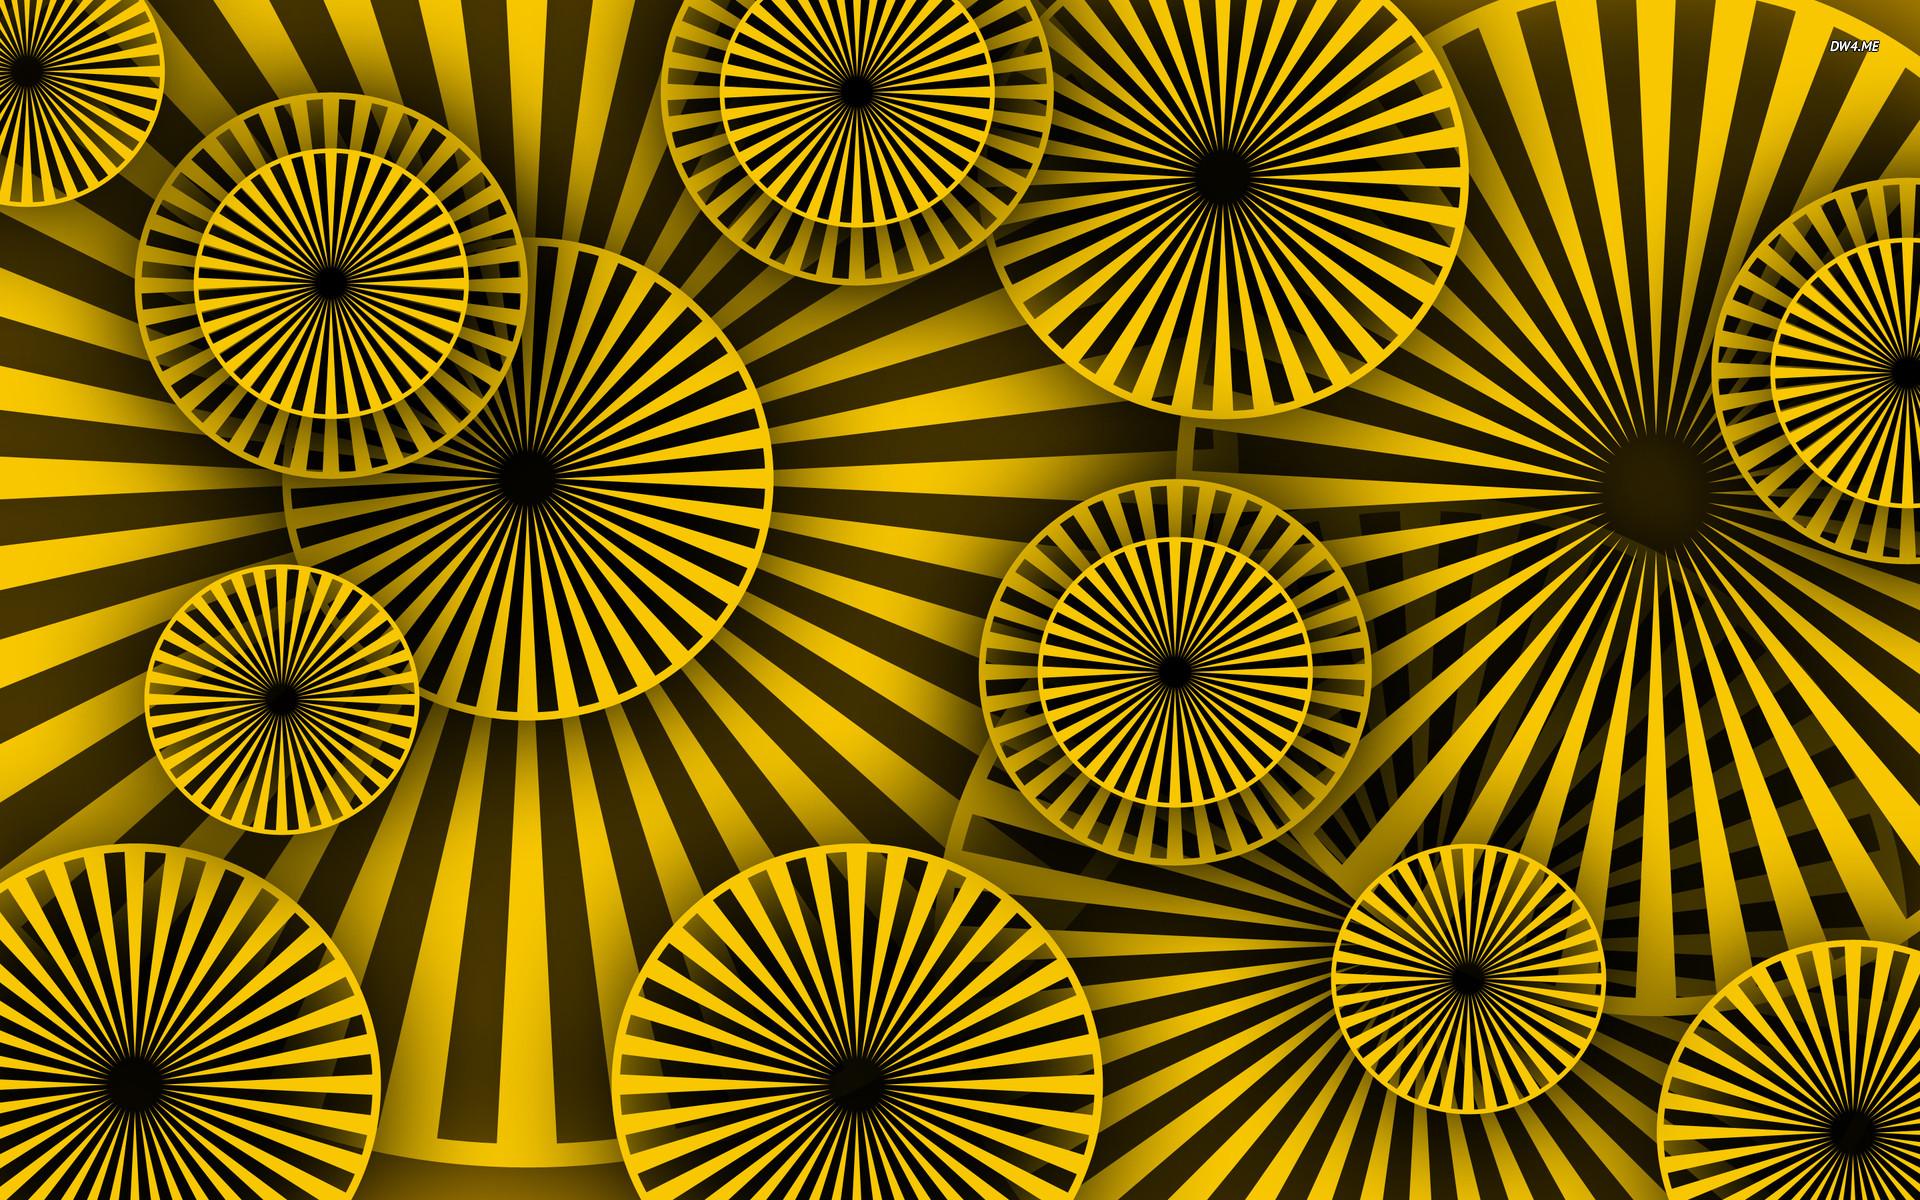 Filename: 3064-hypnotic-rays-on-circles-1920×1200-abstract-wallpaper.jpg